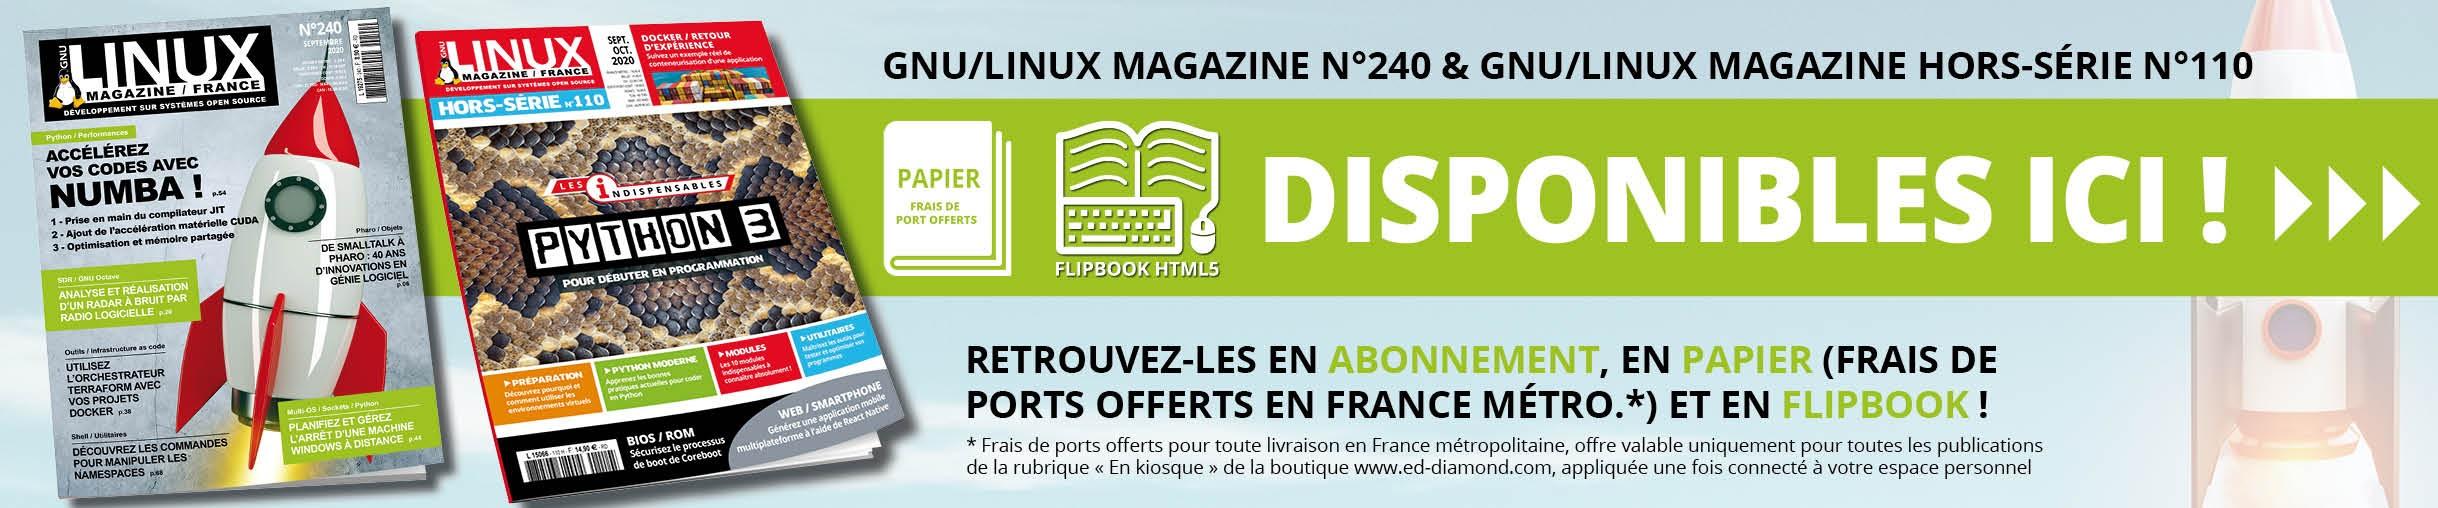 GNU/Linux Magazine 240 et son Hors-Série n°110